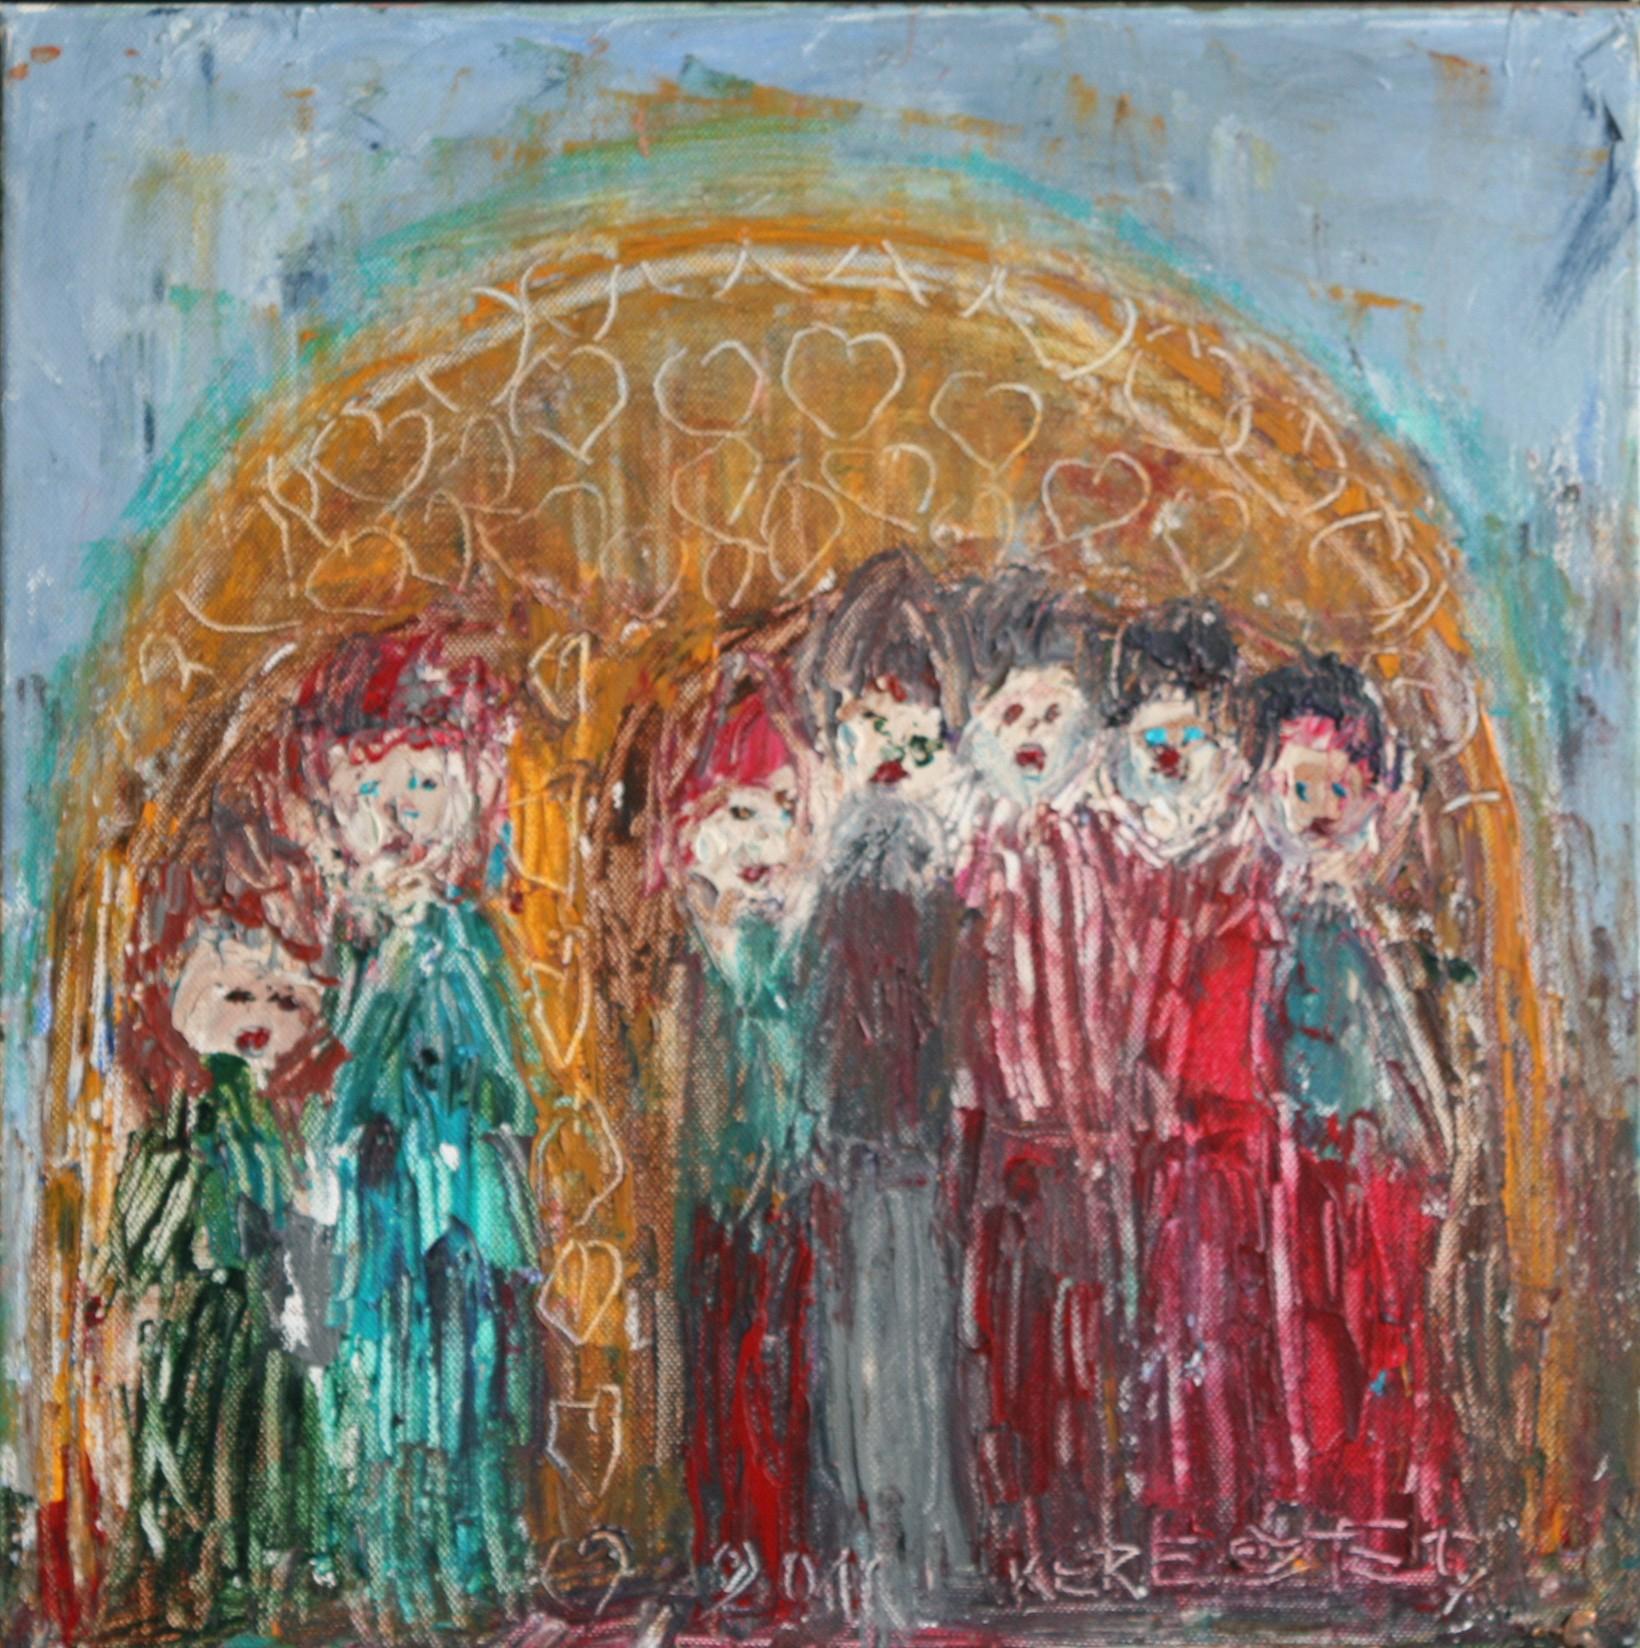 toile 24 - magdalena keresztes, artiste peintre à amiens